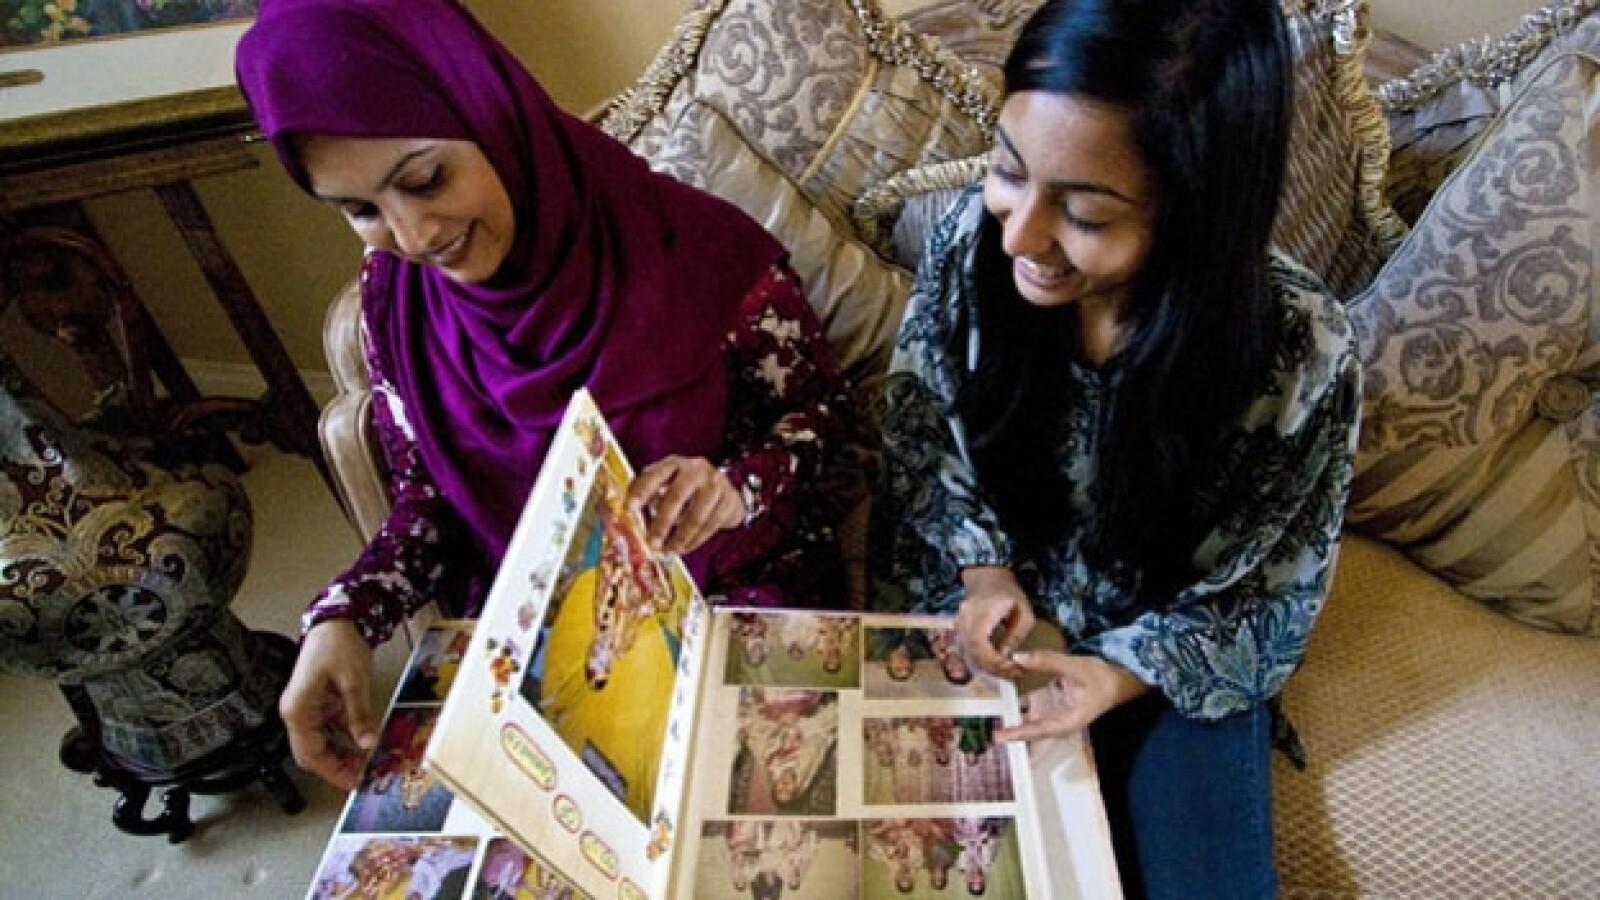 11-S - familia musulmana - Ahsrafi y Fahina Chowdhury